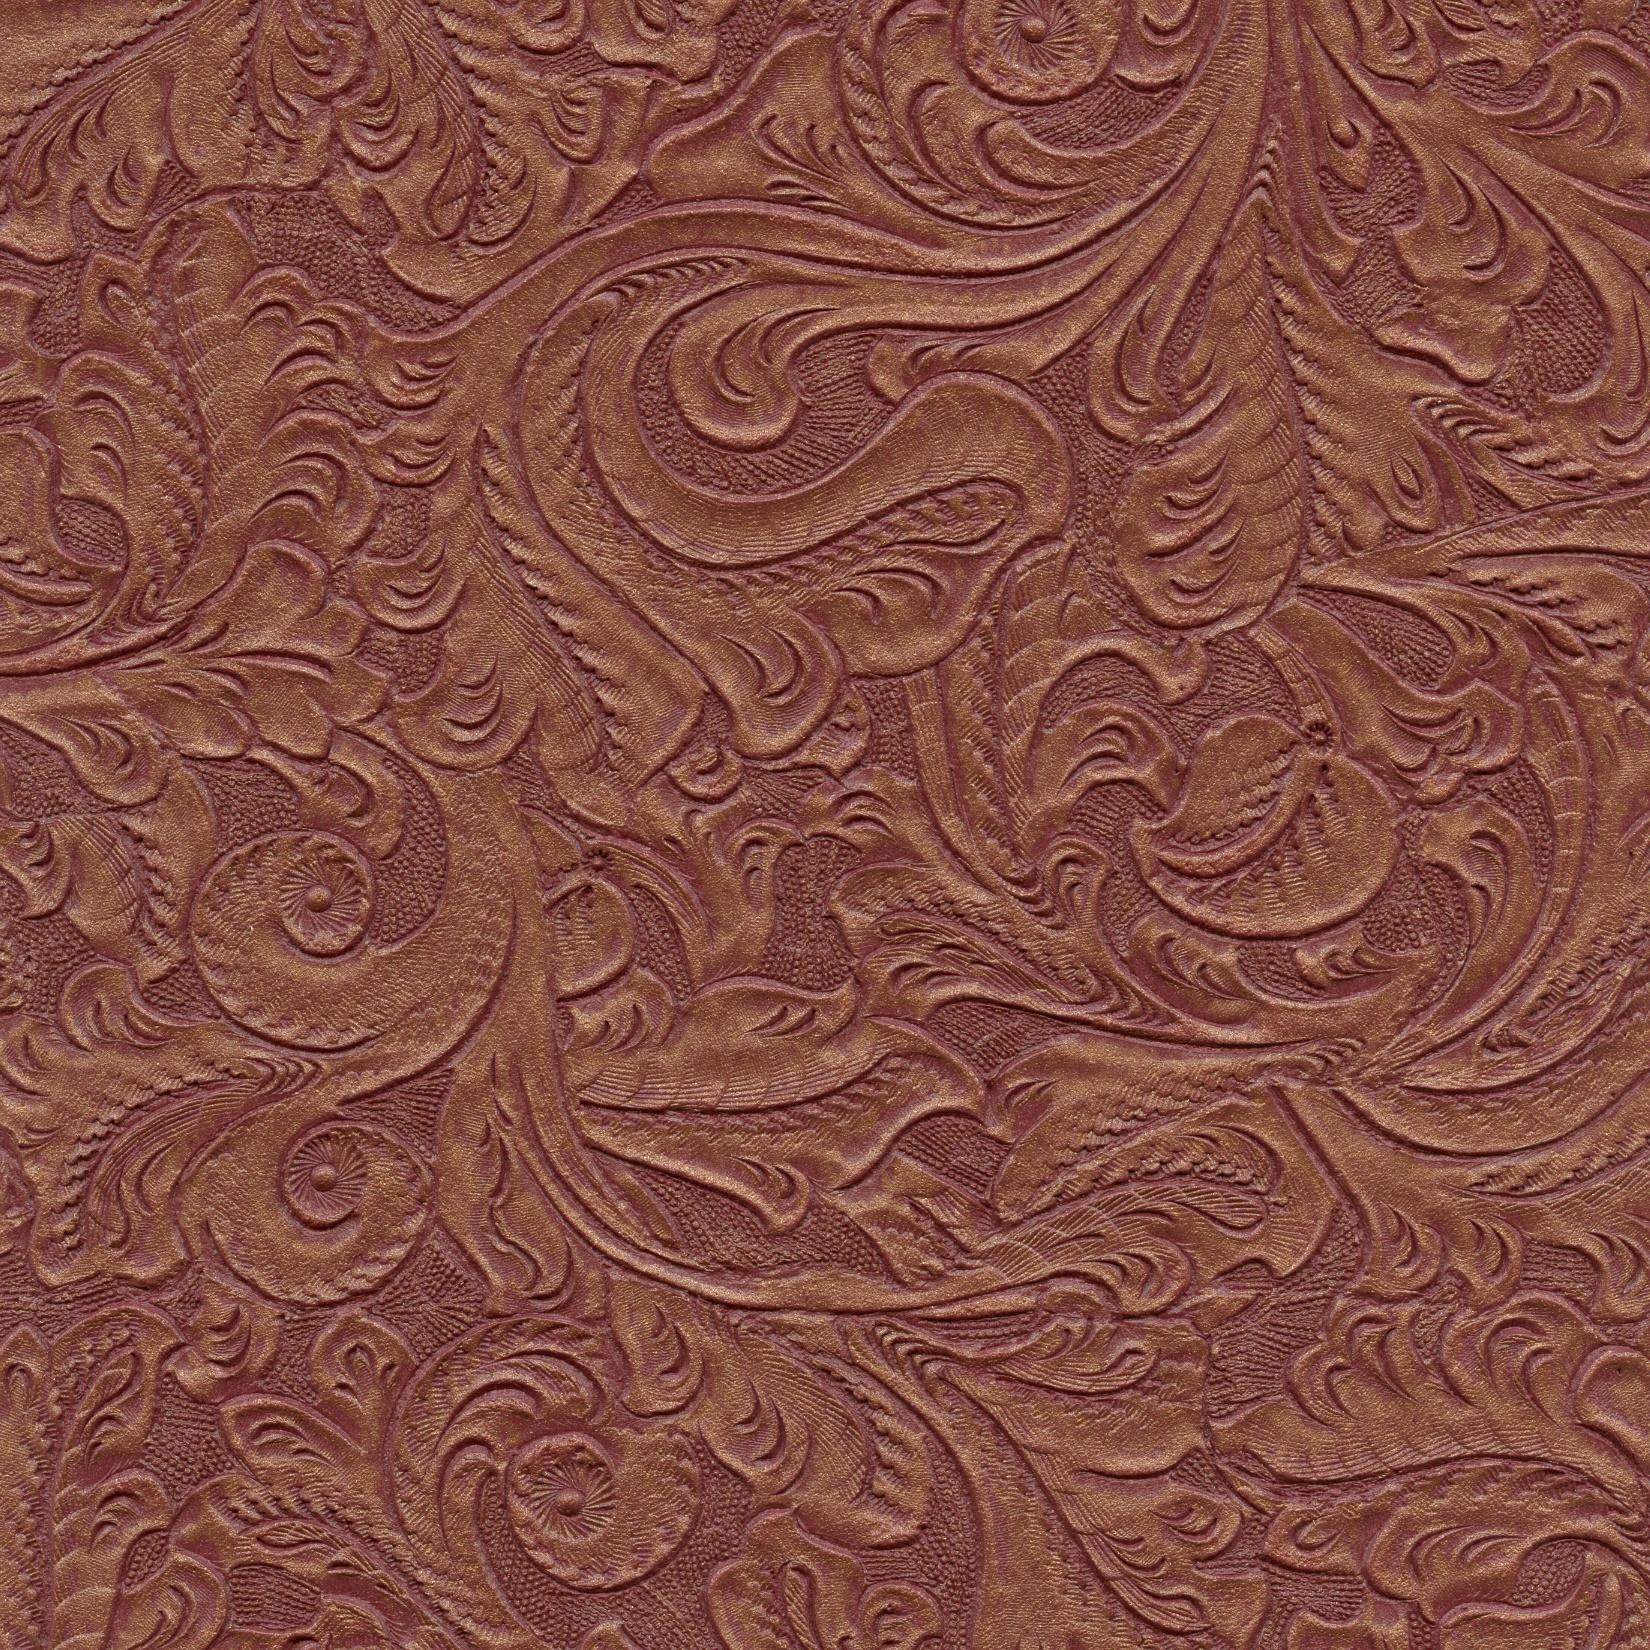 Western Leather Wallpaper - WallpaperSafari